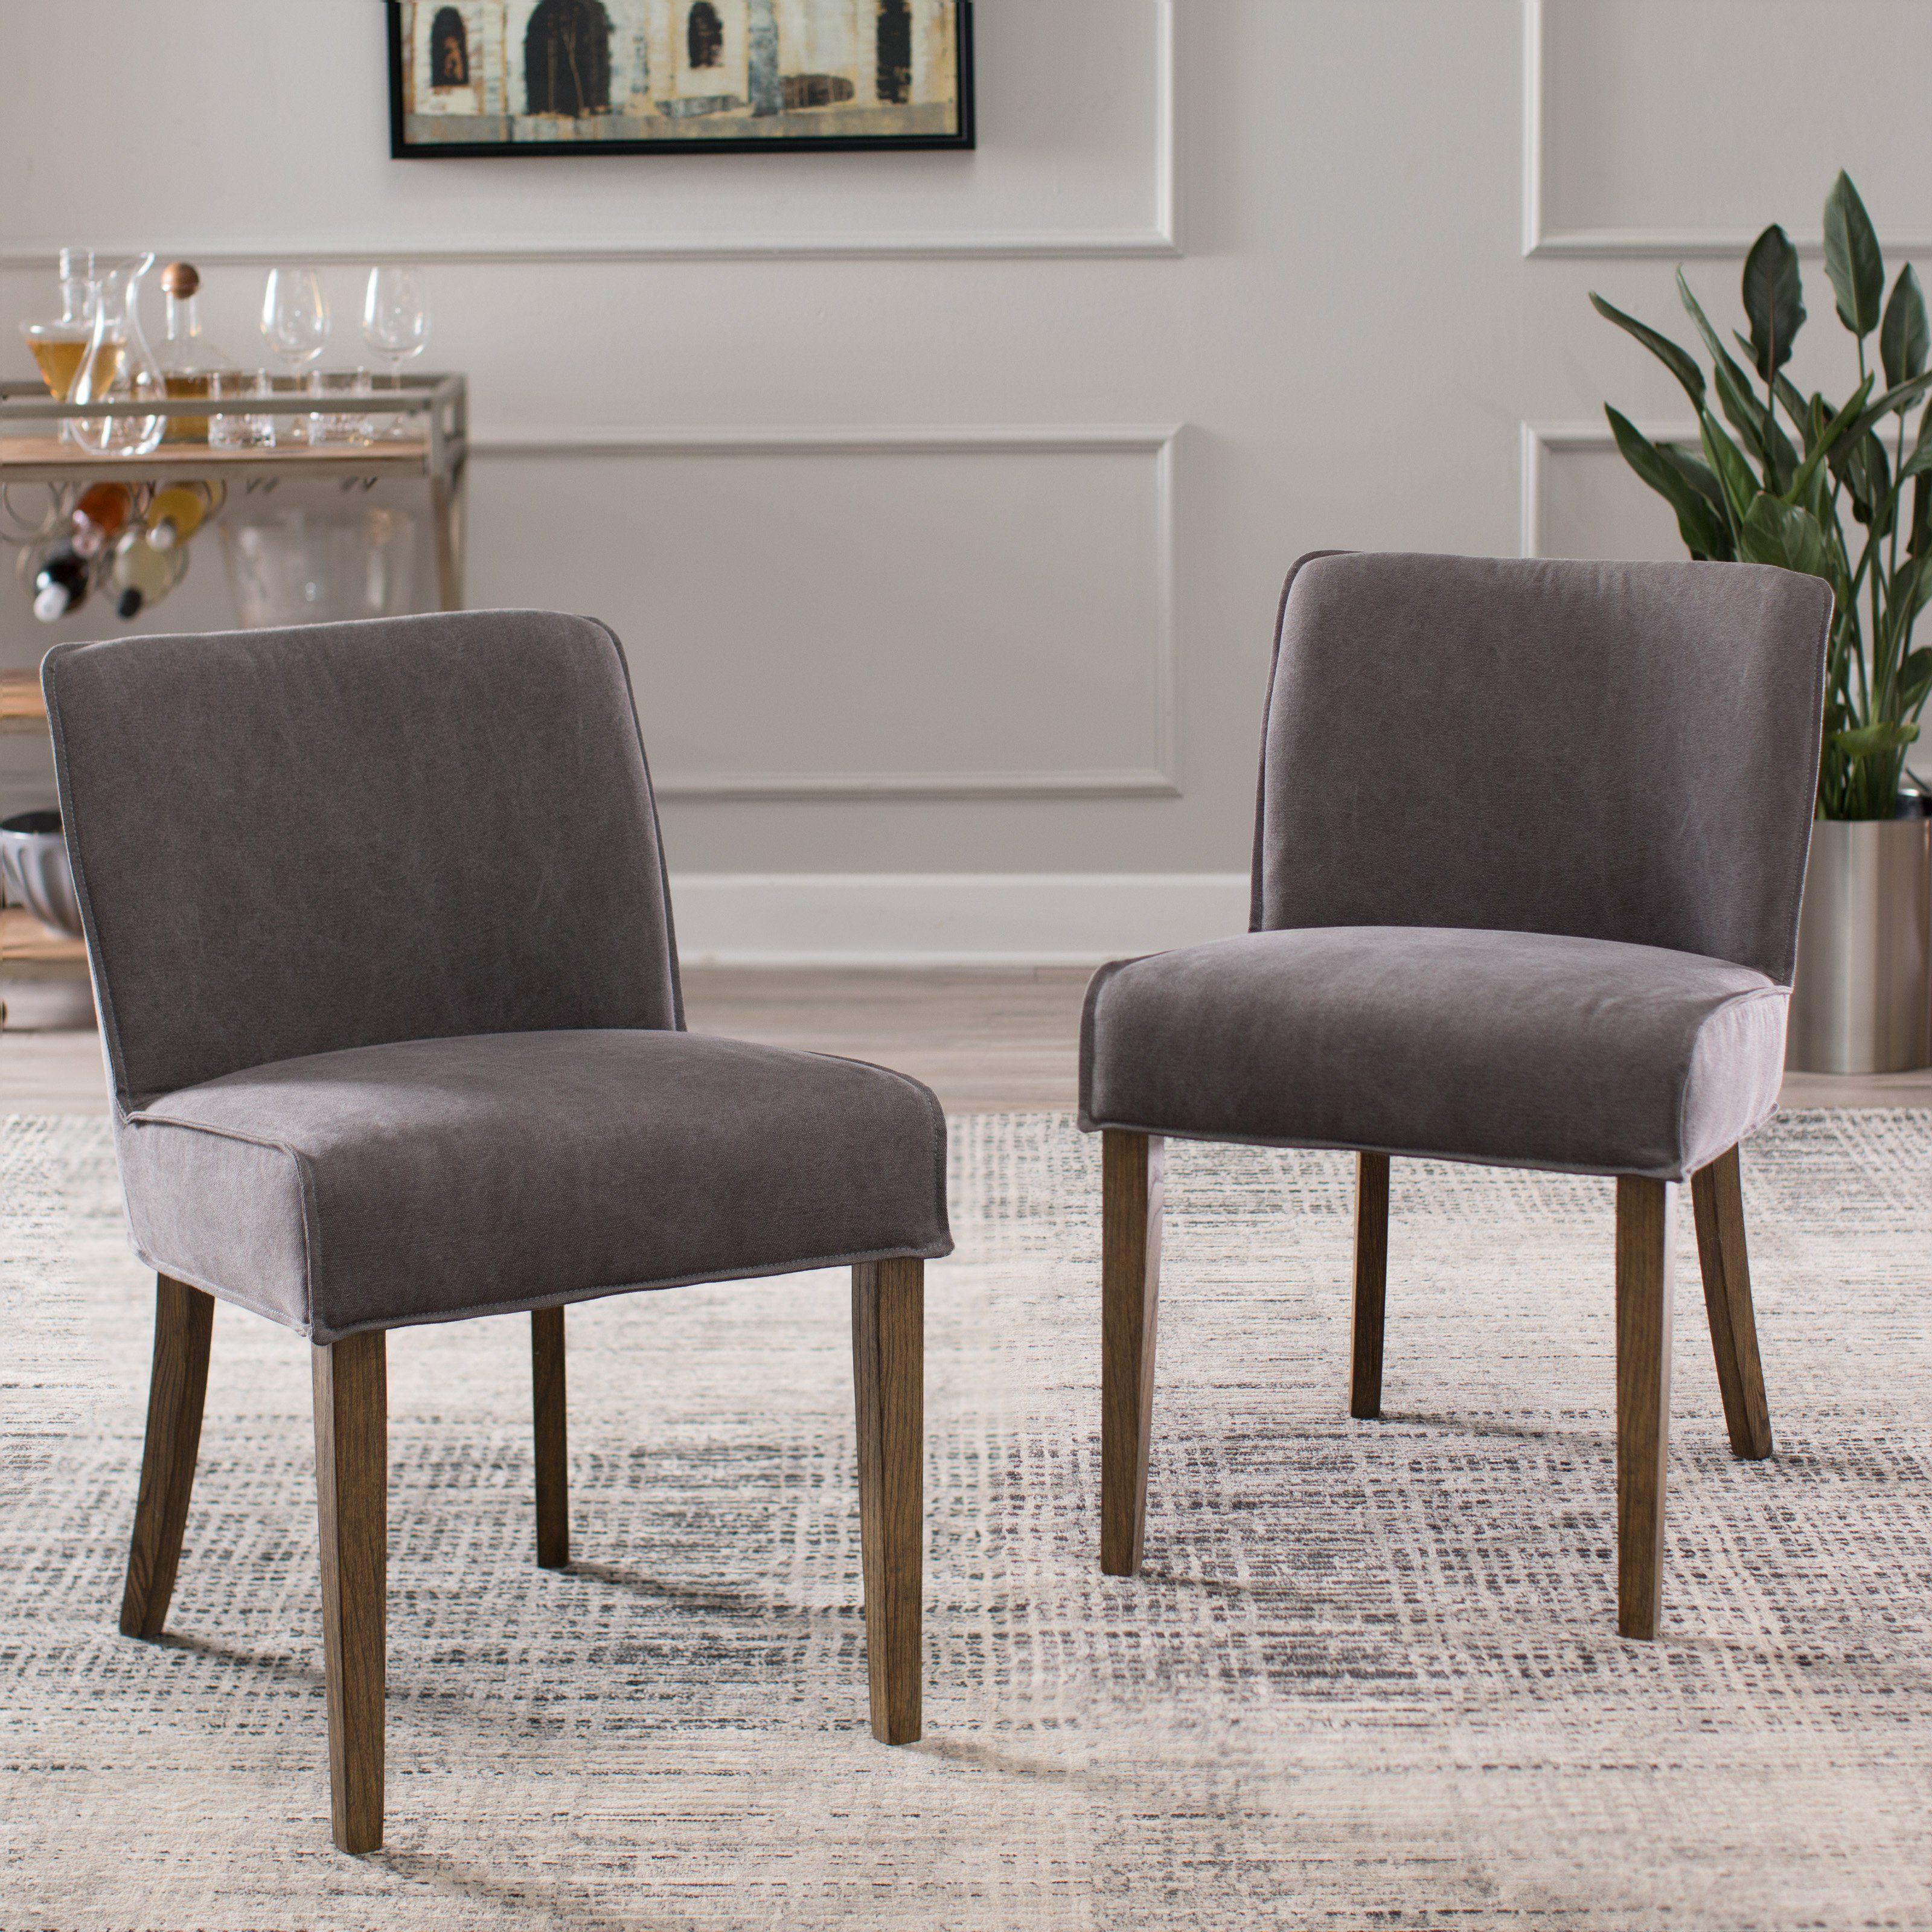 Belham Living Harlow Dining Chair- Set Of 2